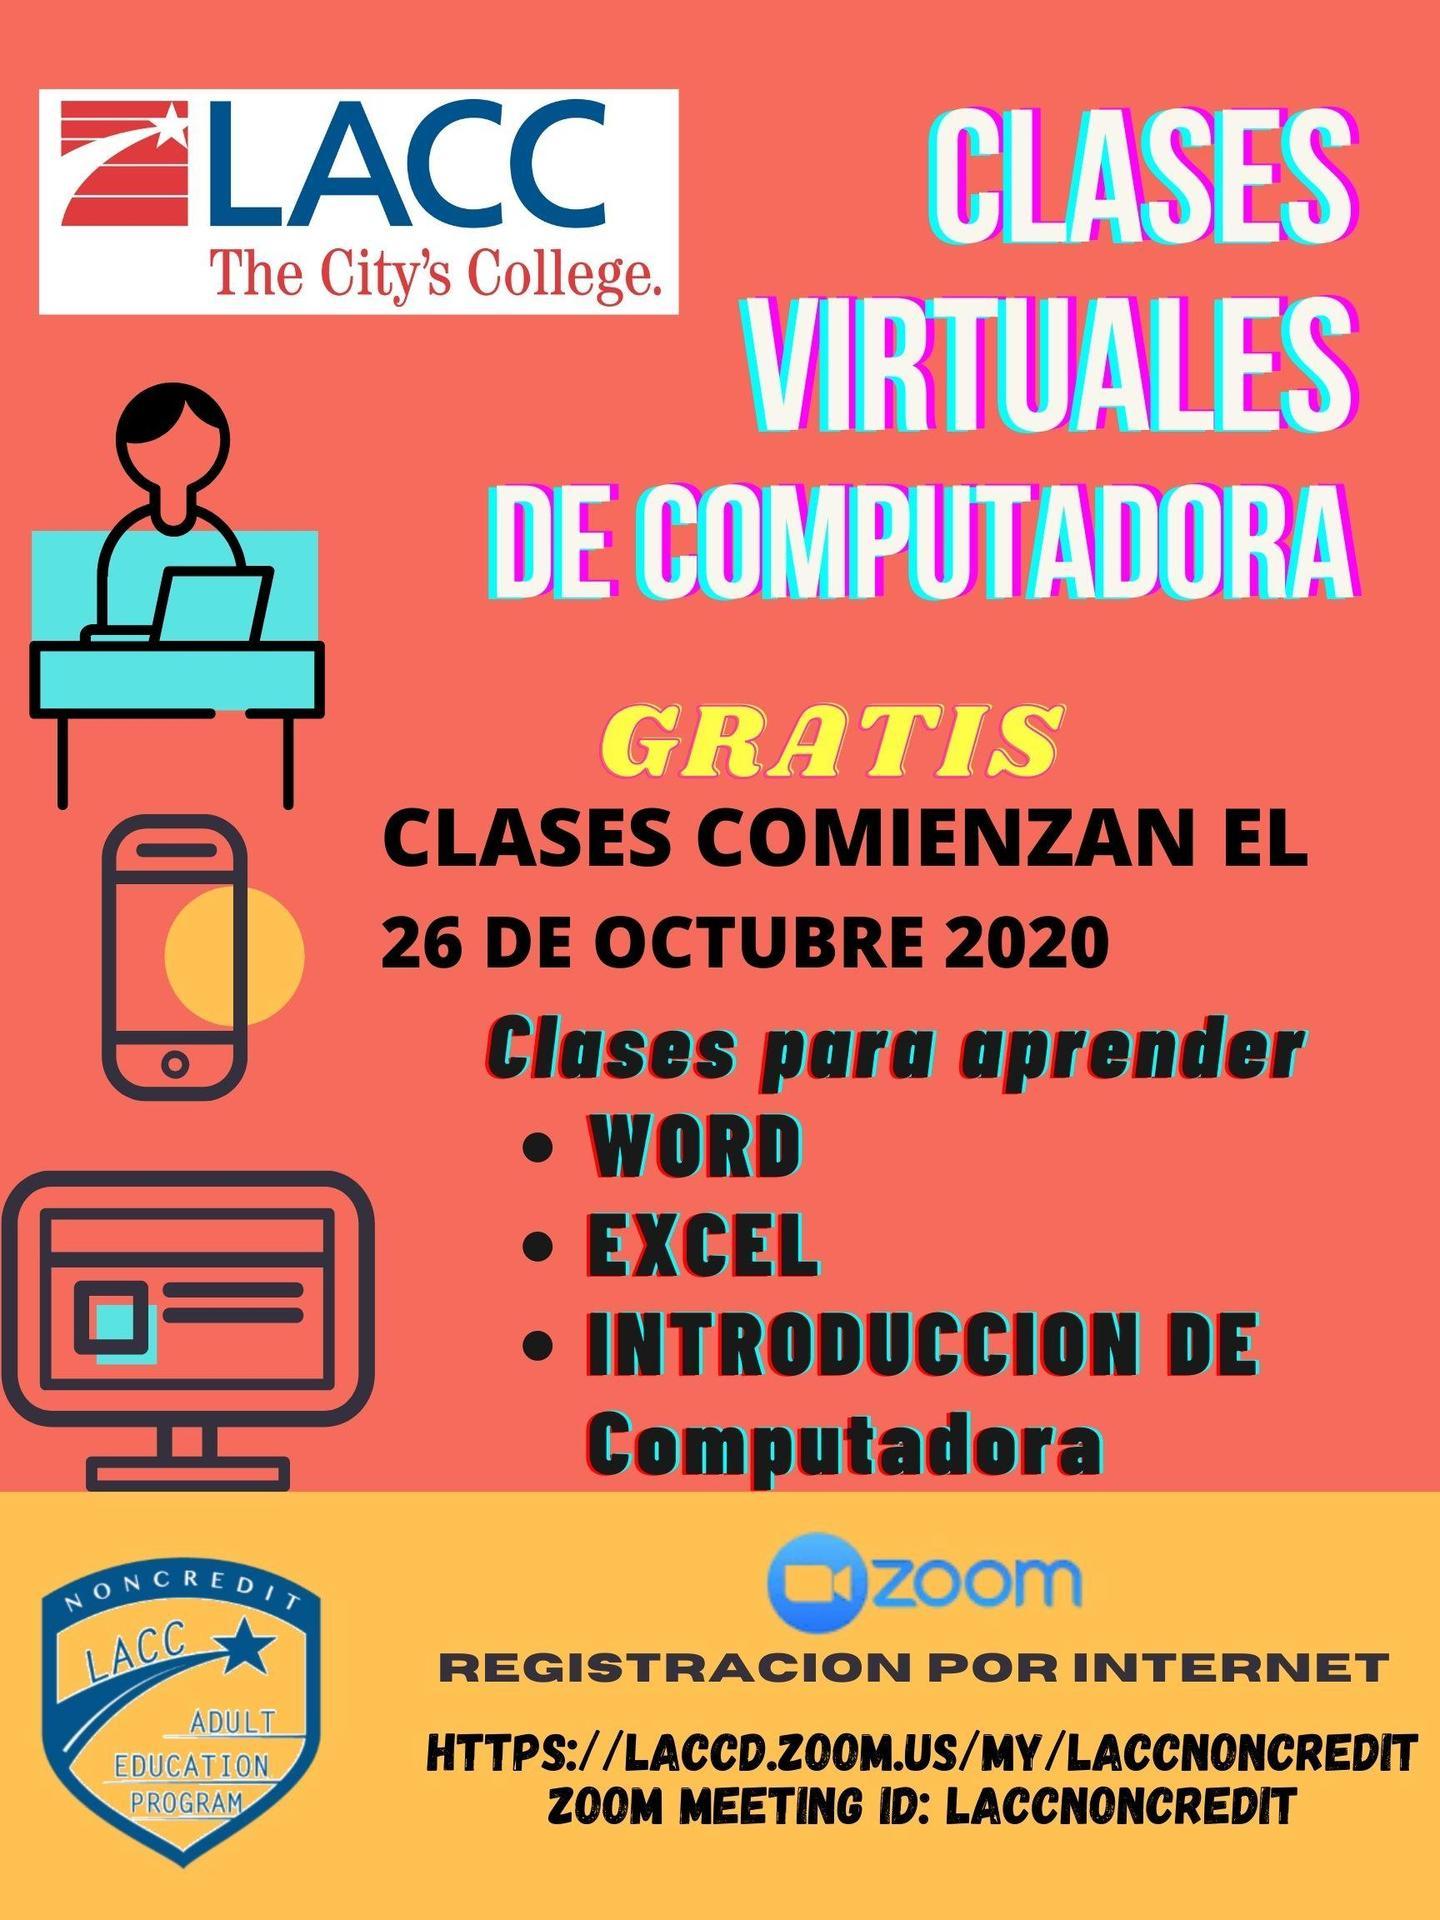 Clases Virtuales de Computadora